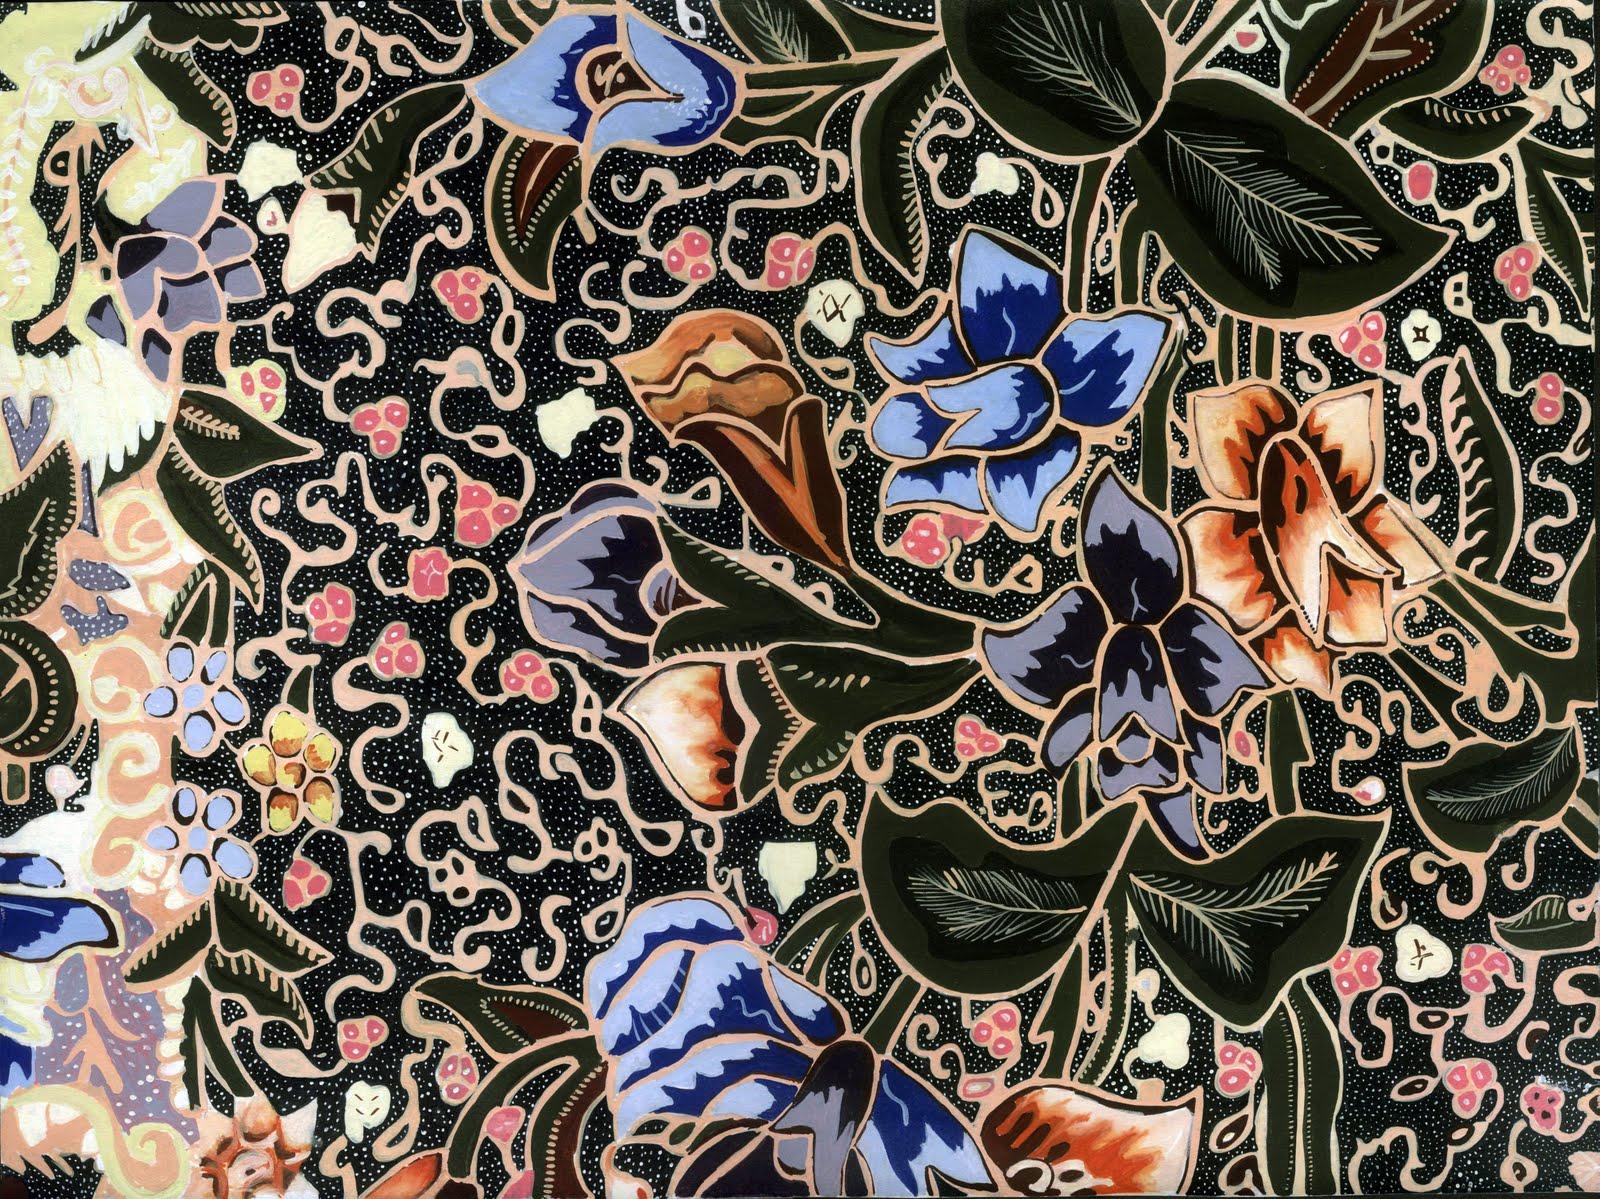 SEJARAH BATIK | Sabiha Ramadani's